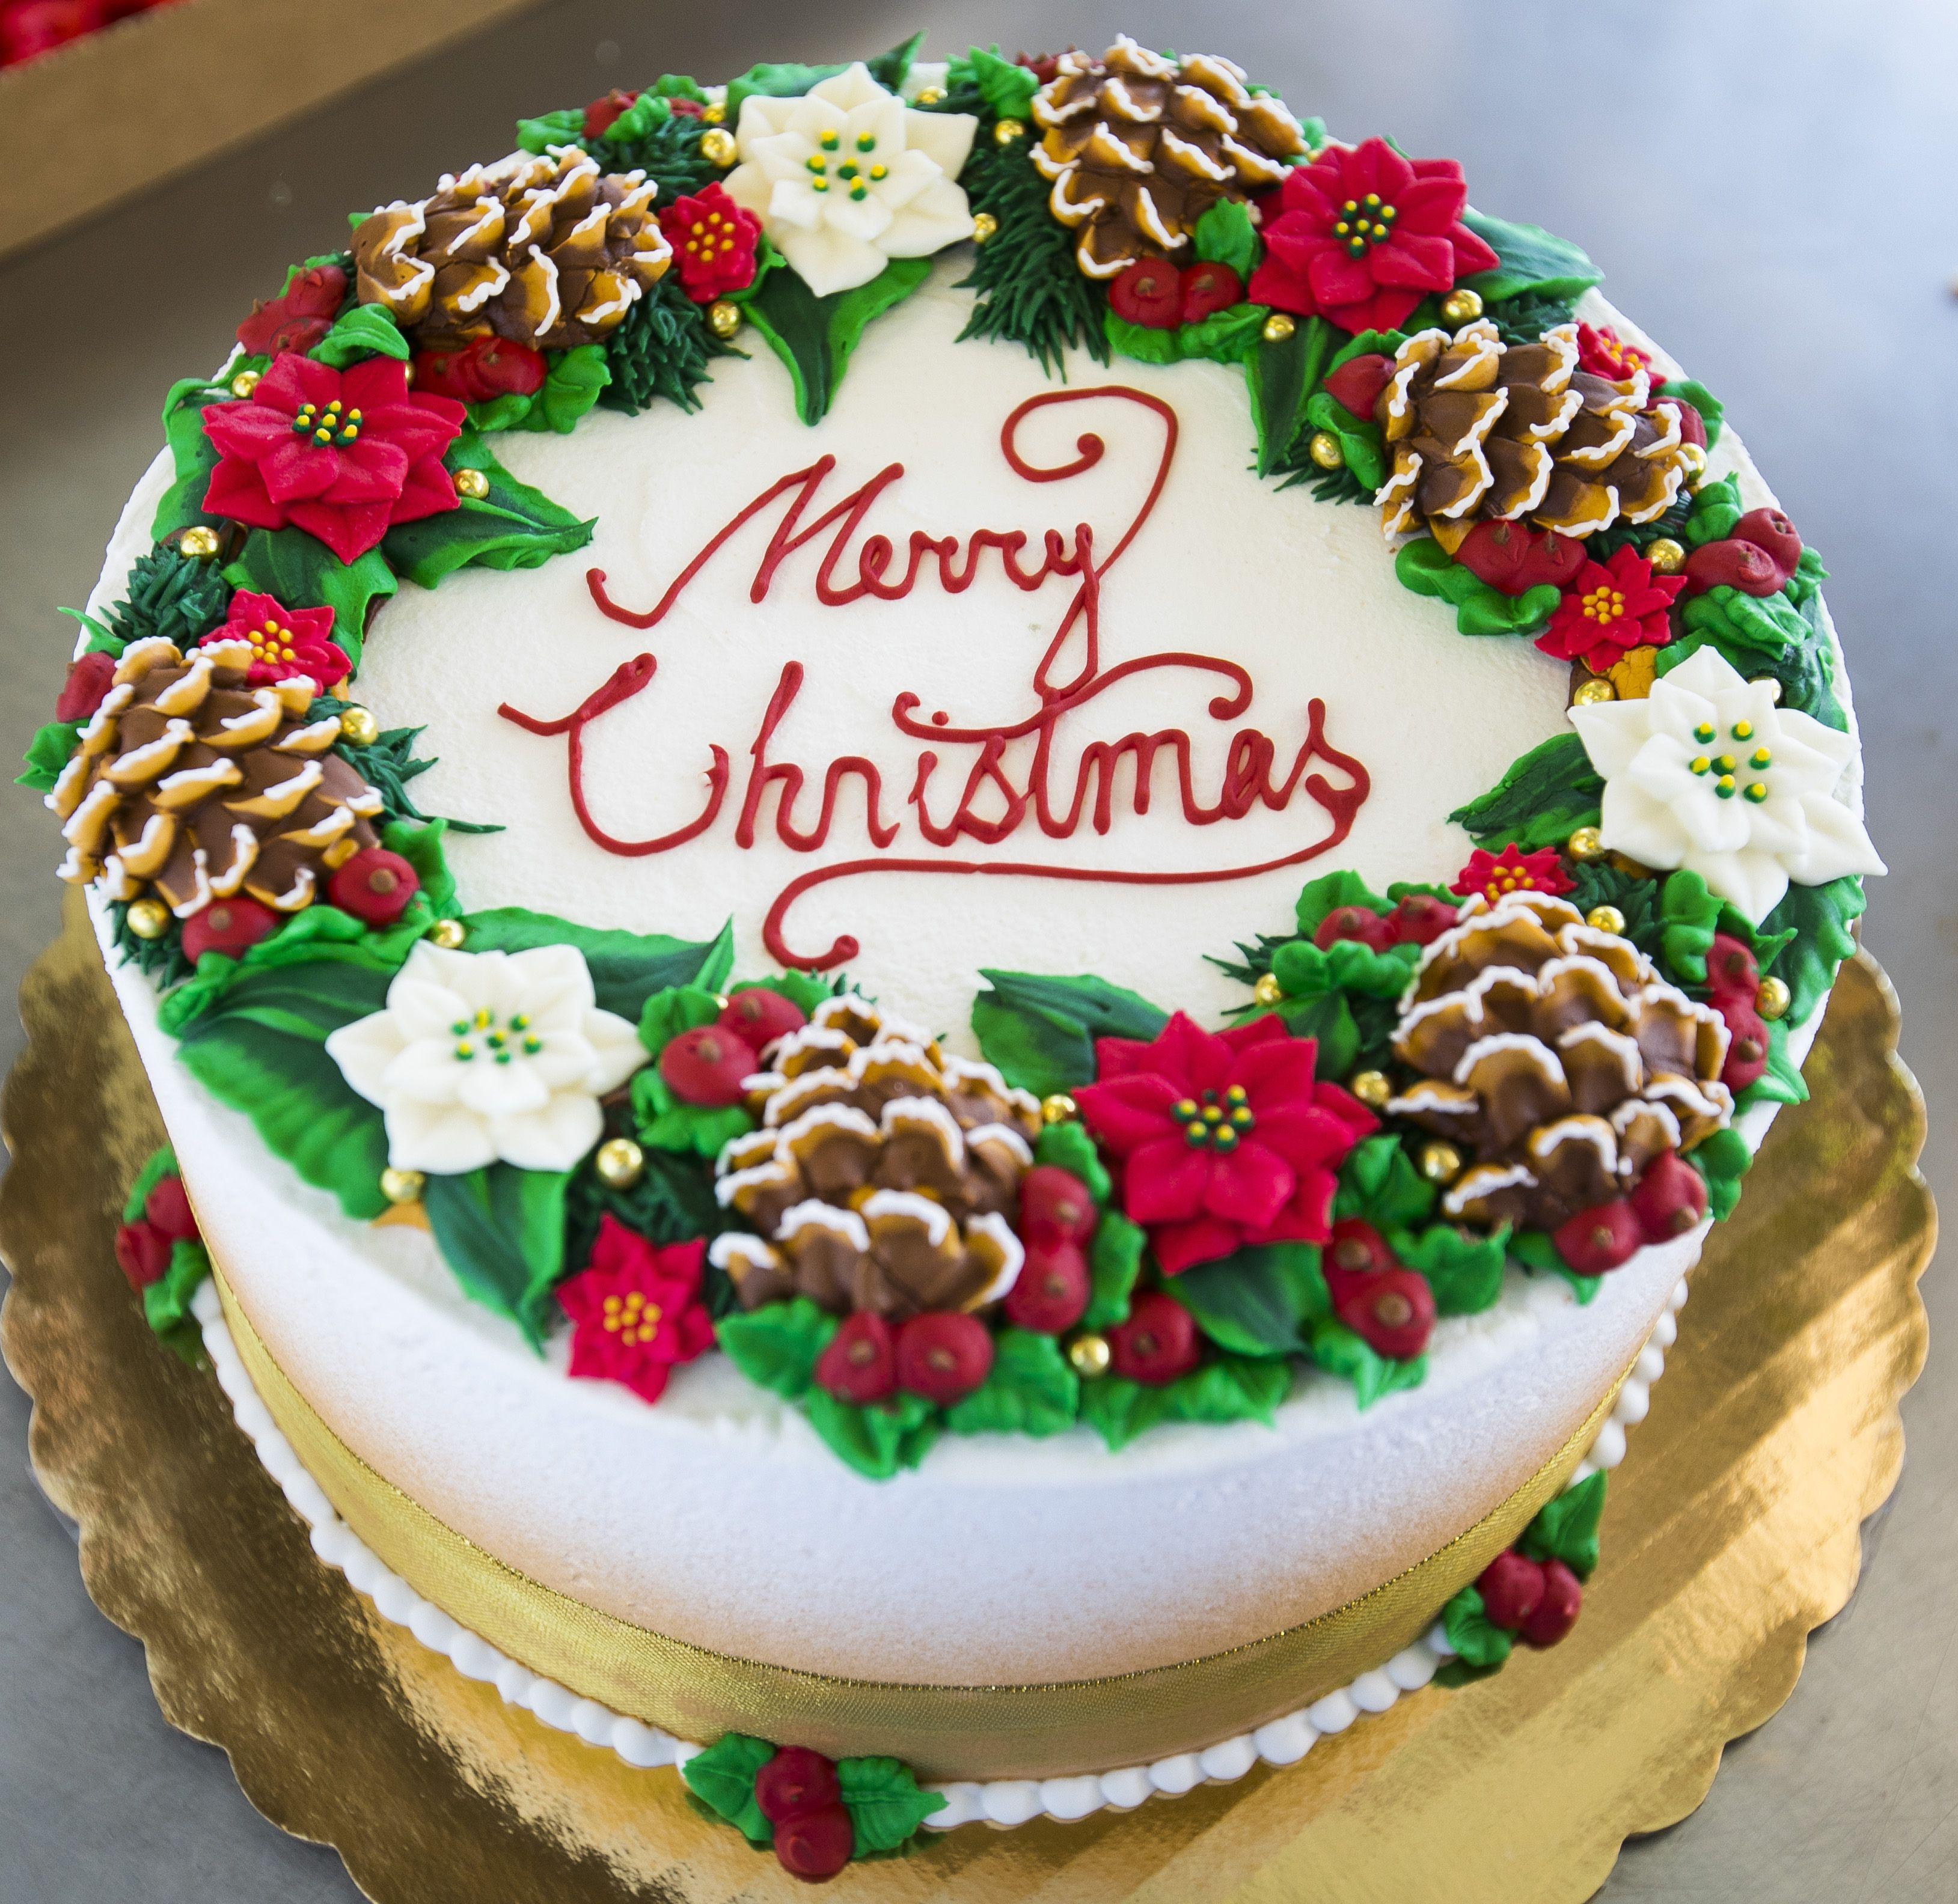 Christmas Sheet Cake  Bakery Cakes Christmas and Holiday Cakes